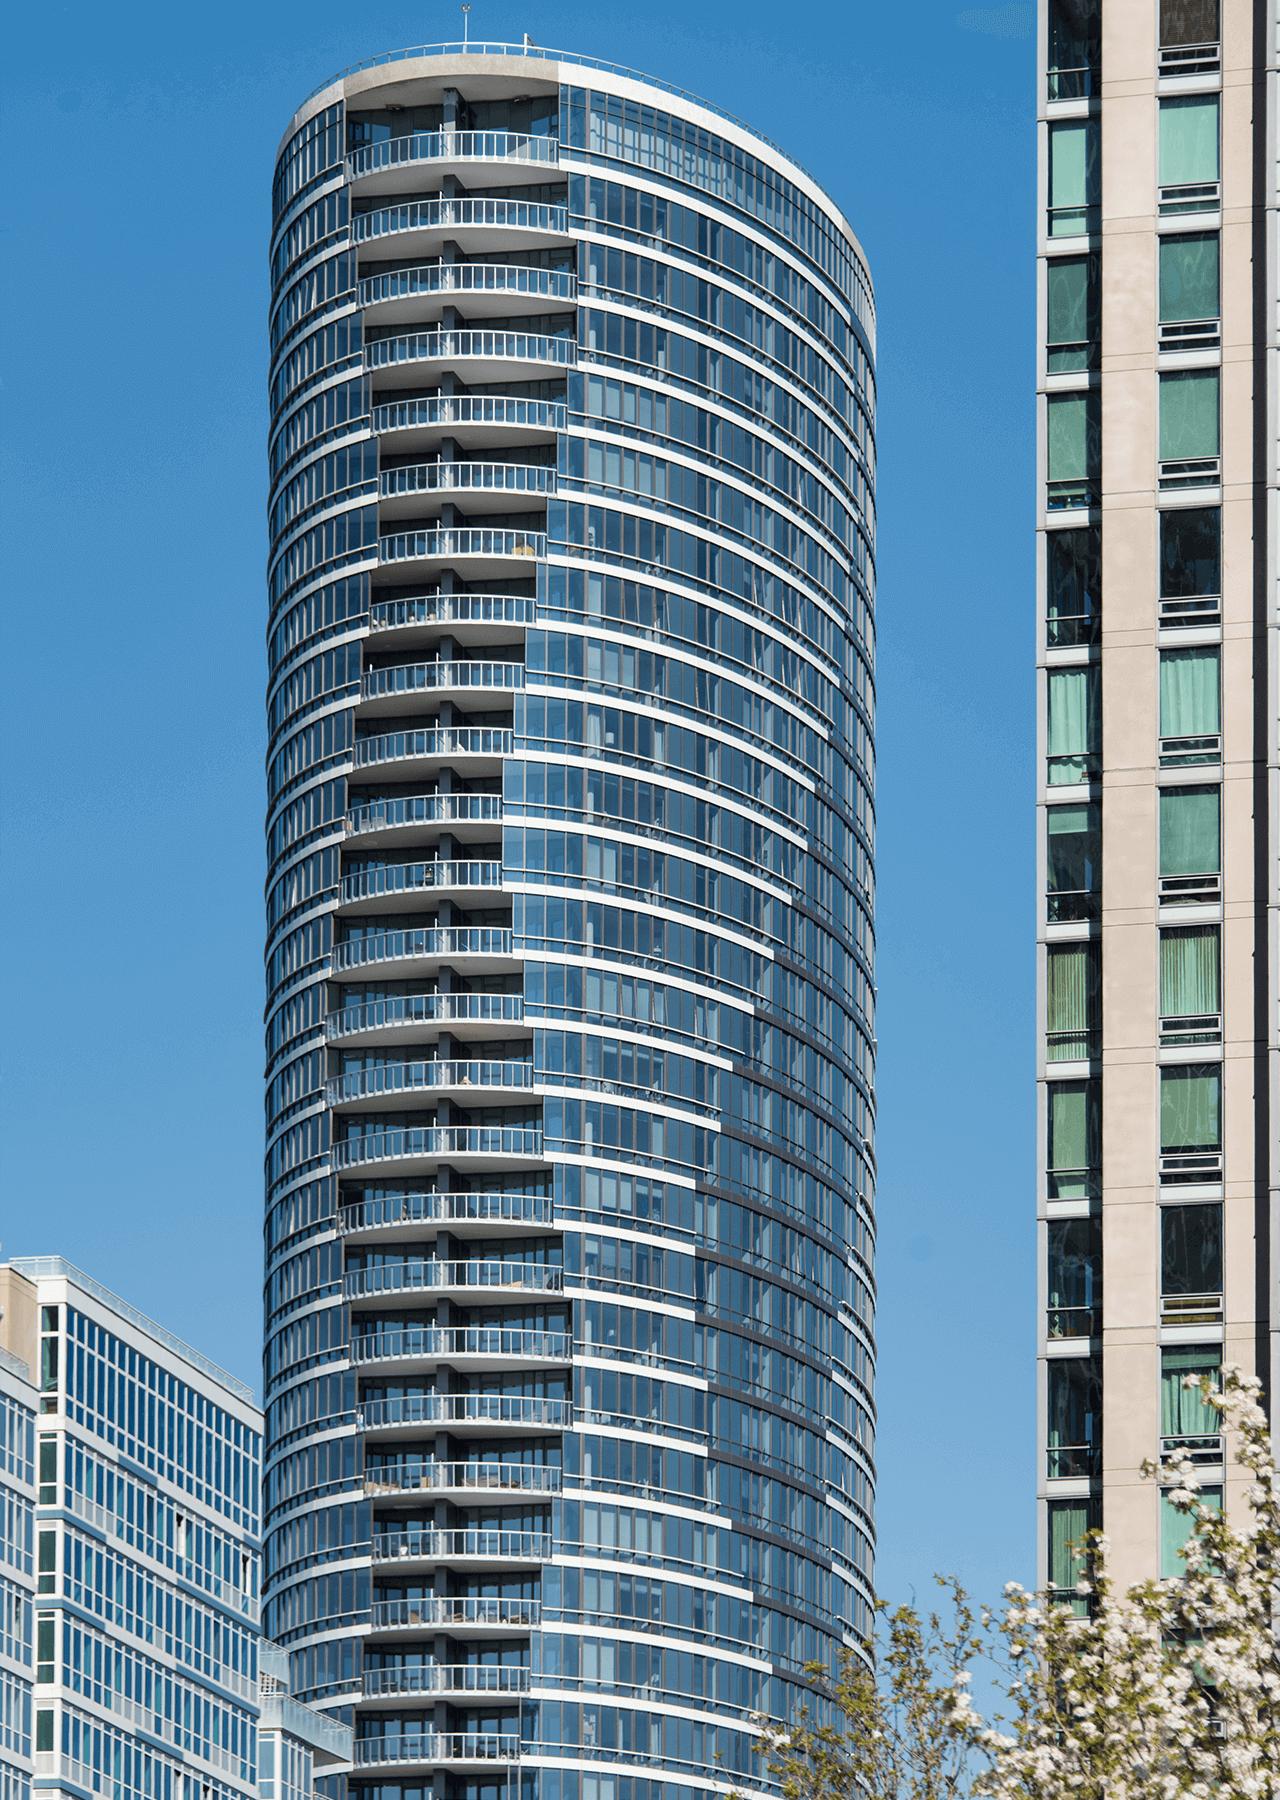 The Elipse Building